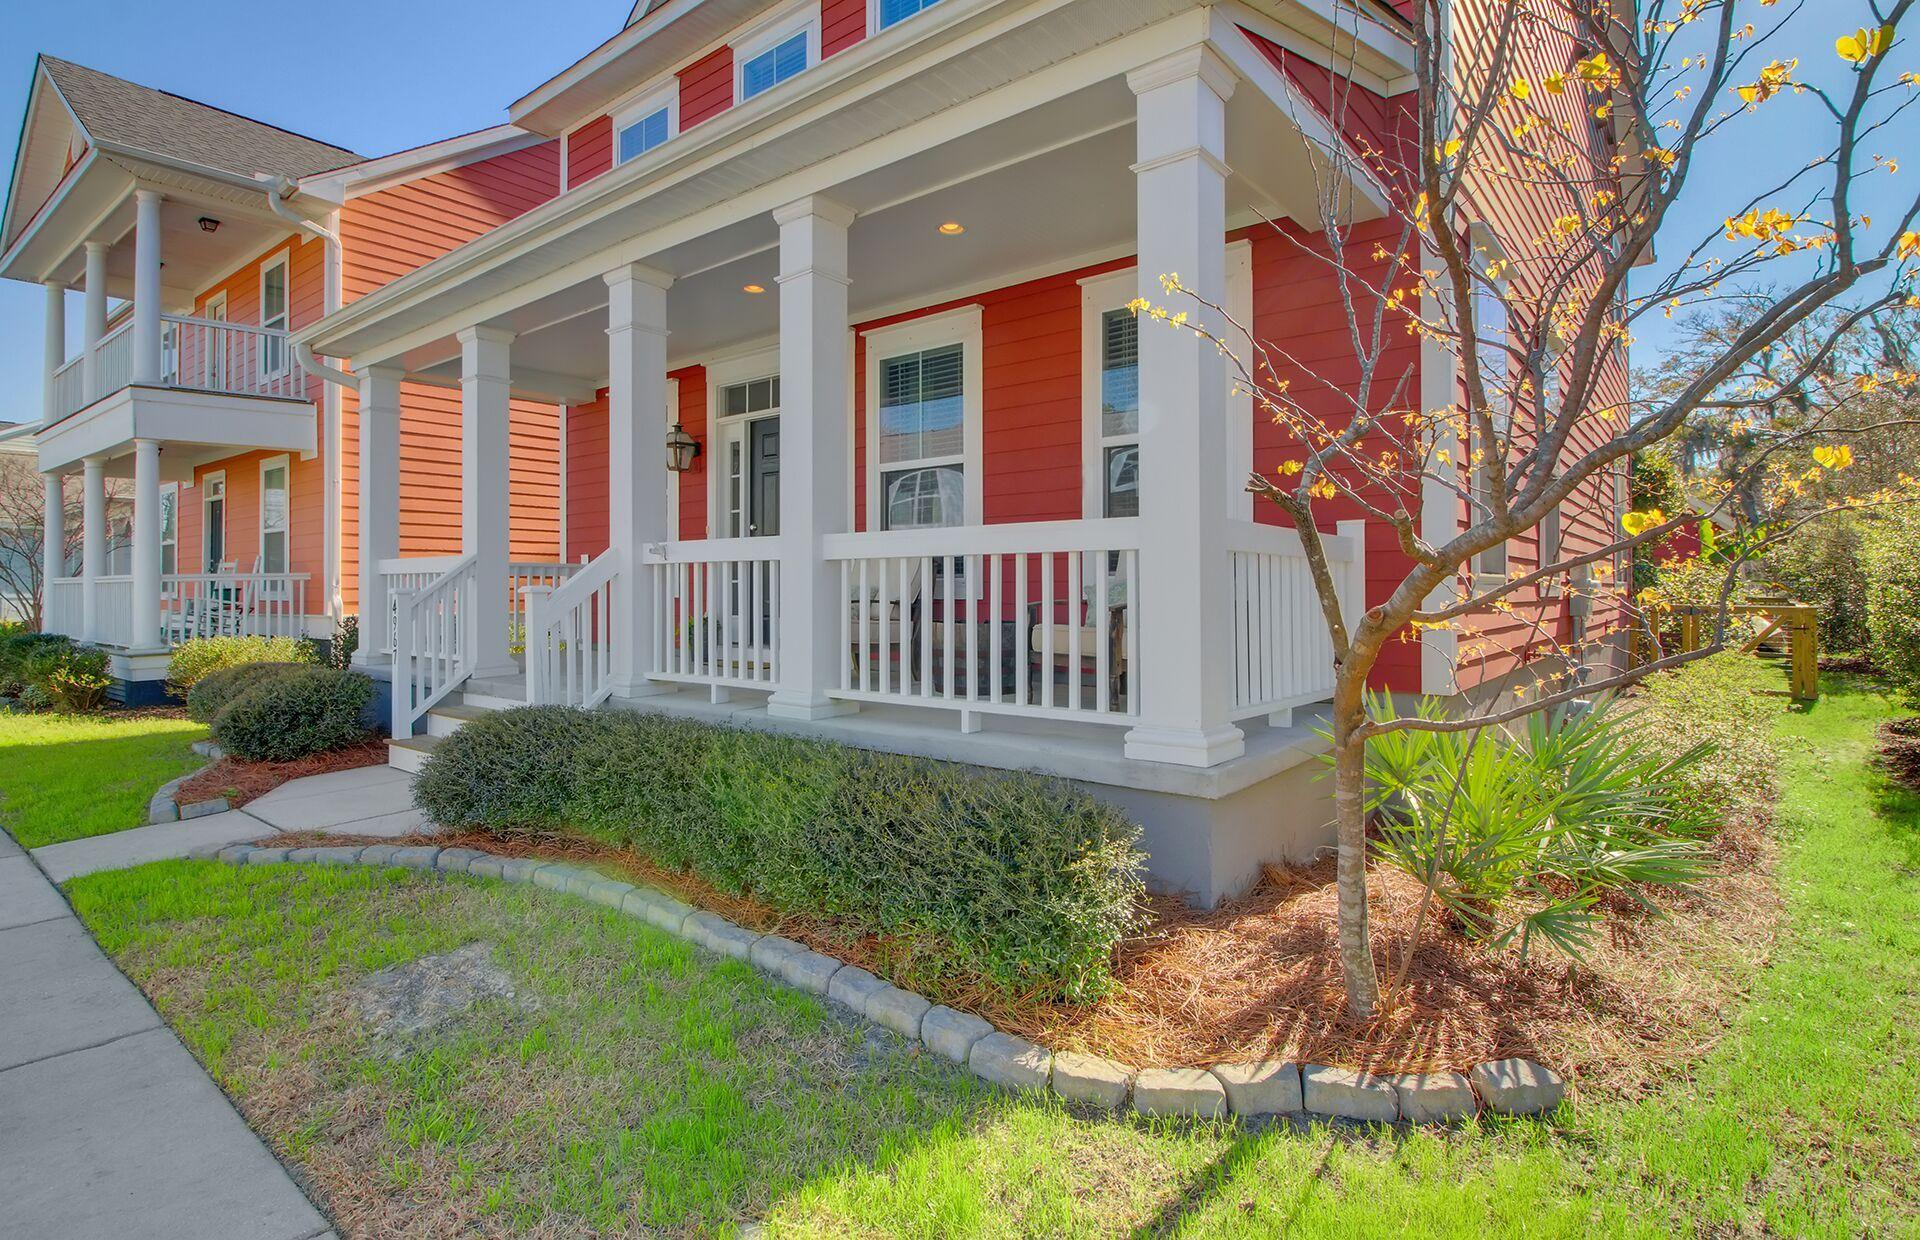 Oak Terrace Preserve Homes For Sale - 4967 Liberty Park, North Charleston, SC - 28